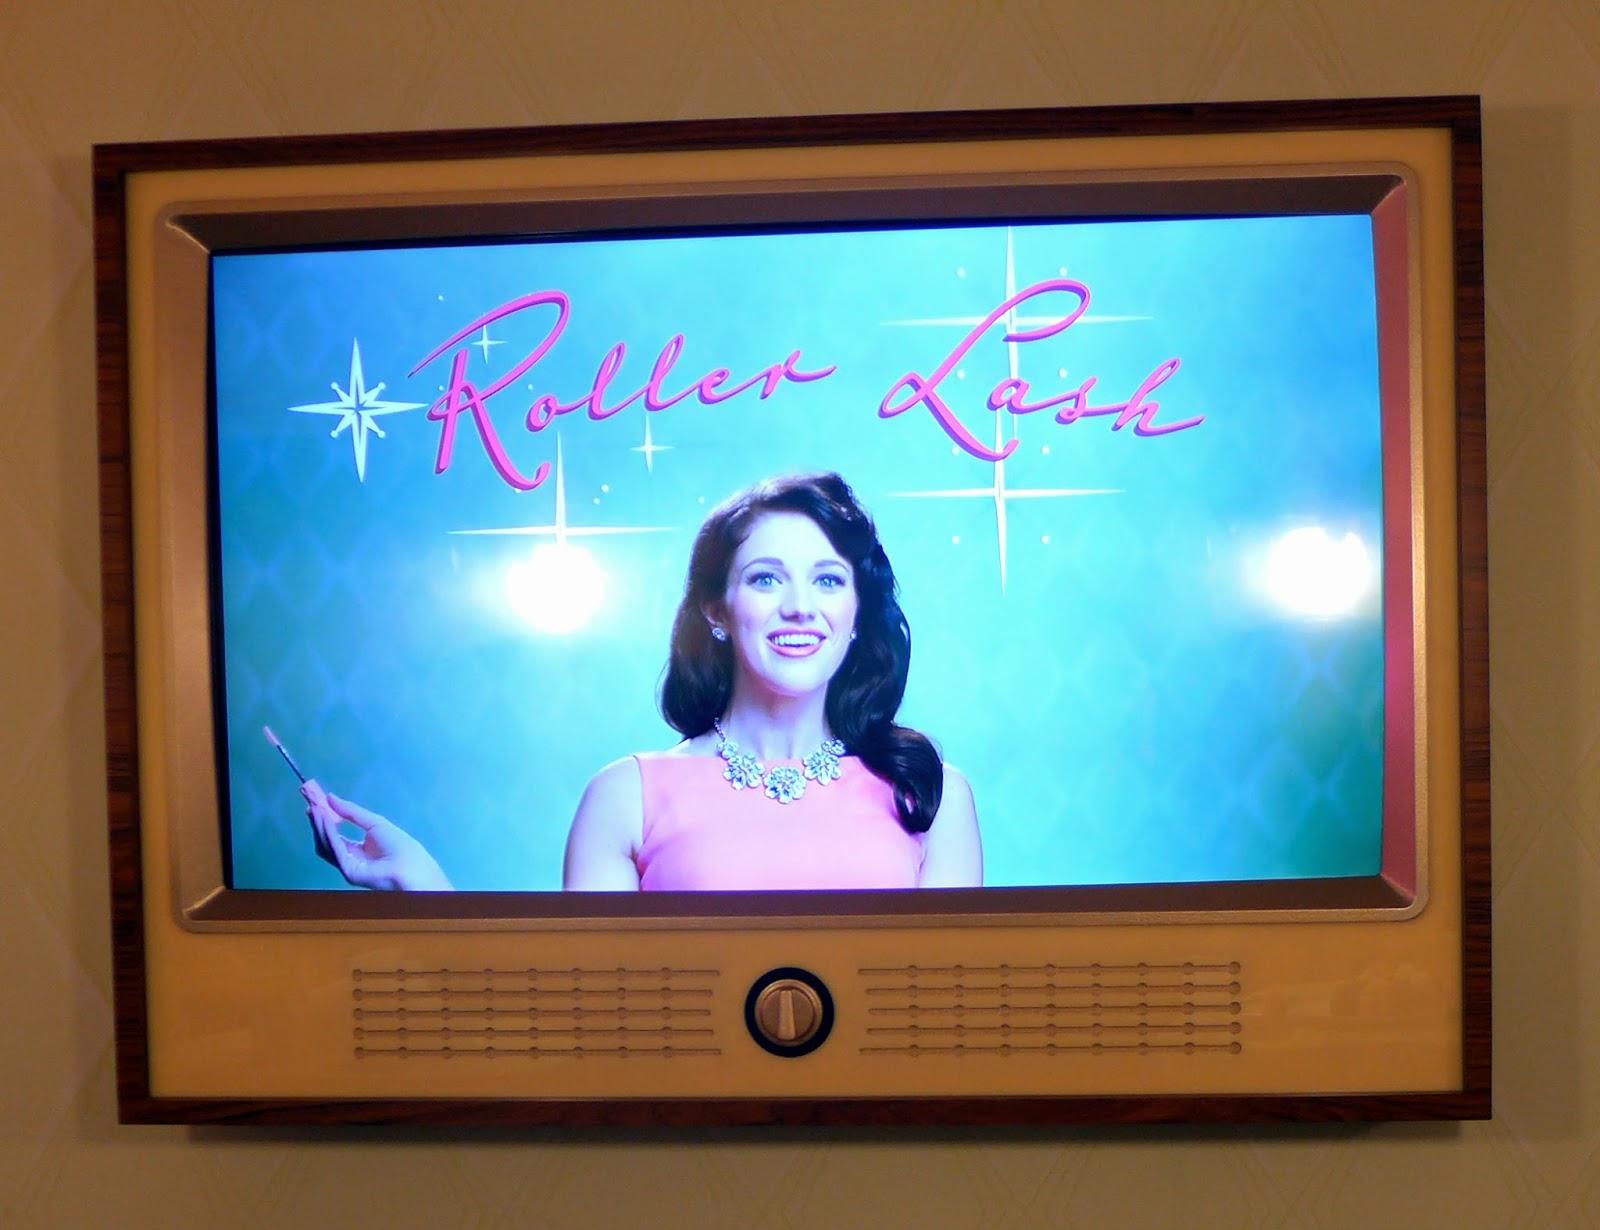 Roller Lash TV